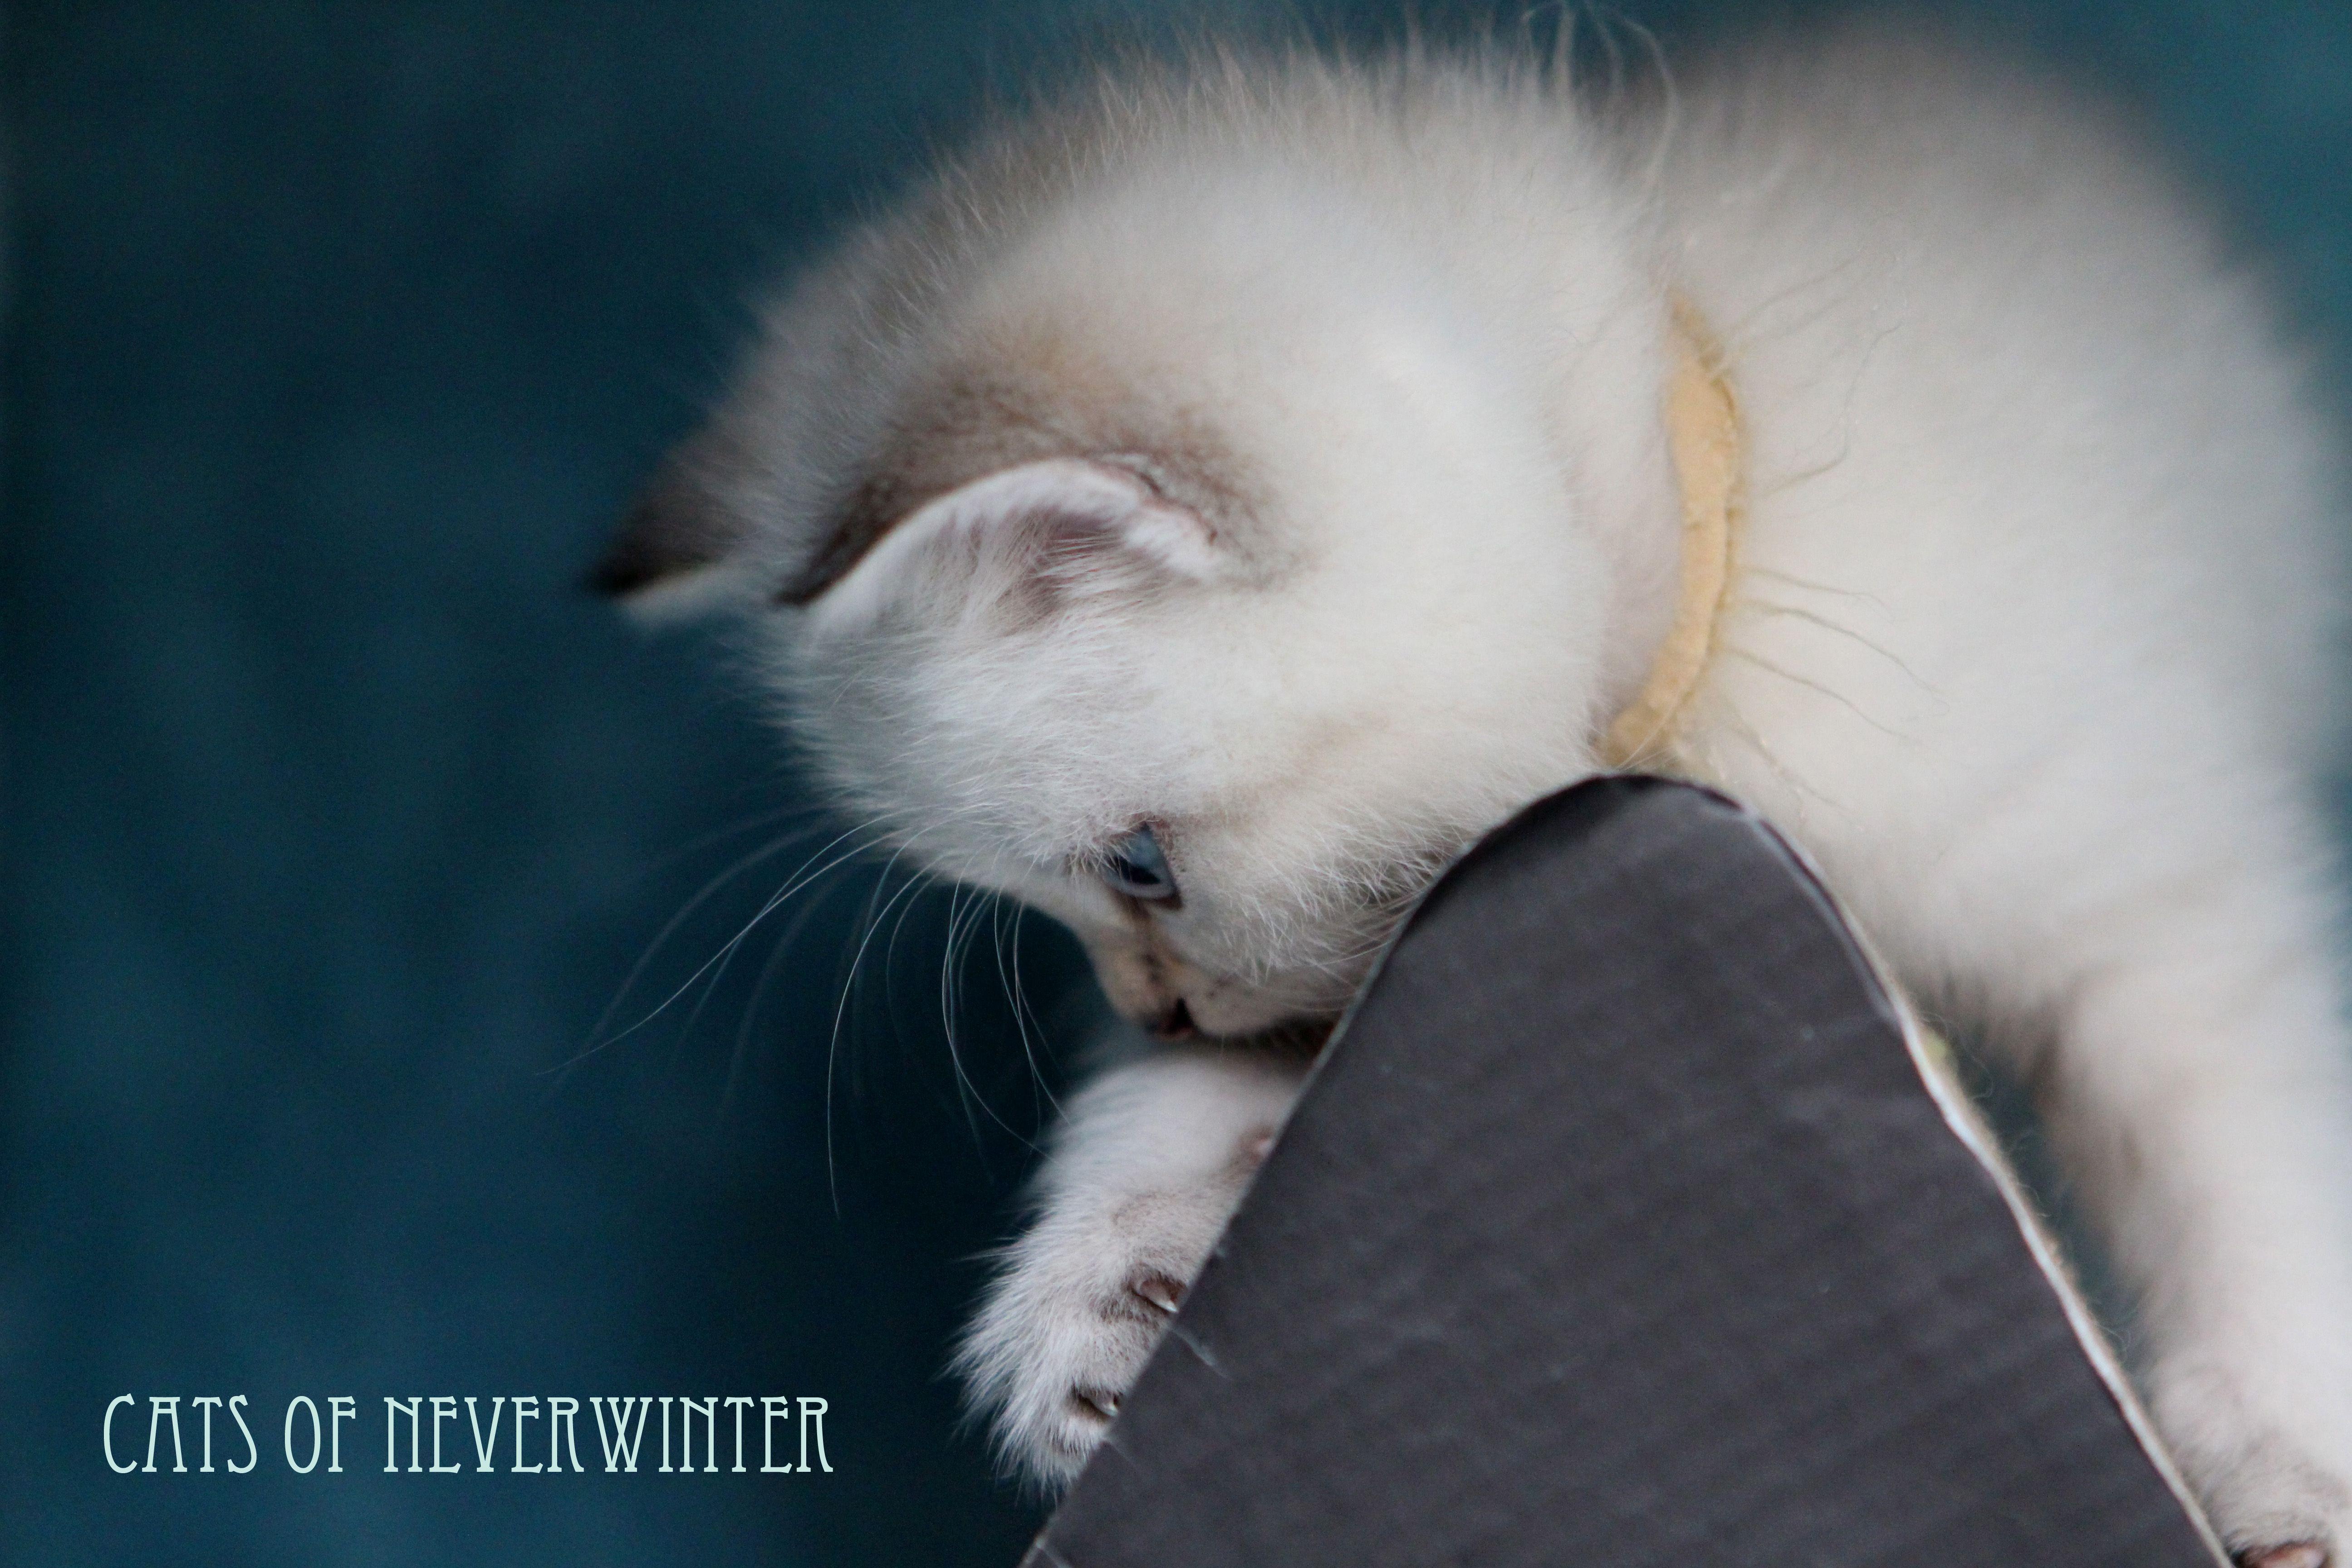 Our British Shorthair Kittens From Gaia Stars Stud From Feline Magic Georgie Porgie Puddin British Shorthair Kittens British Shorthair Kittens